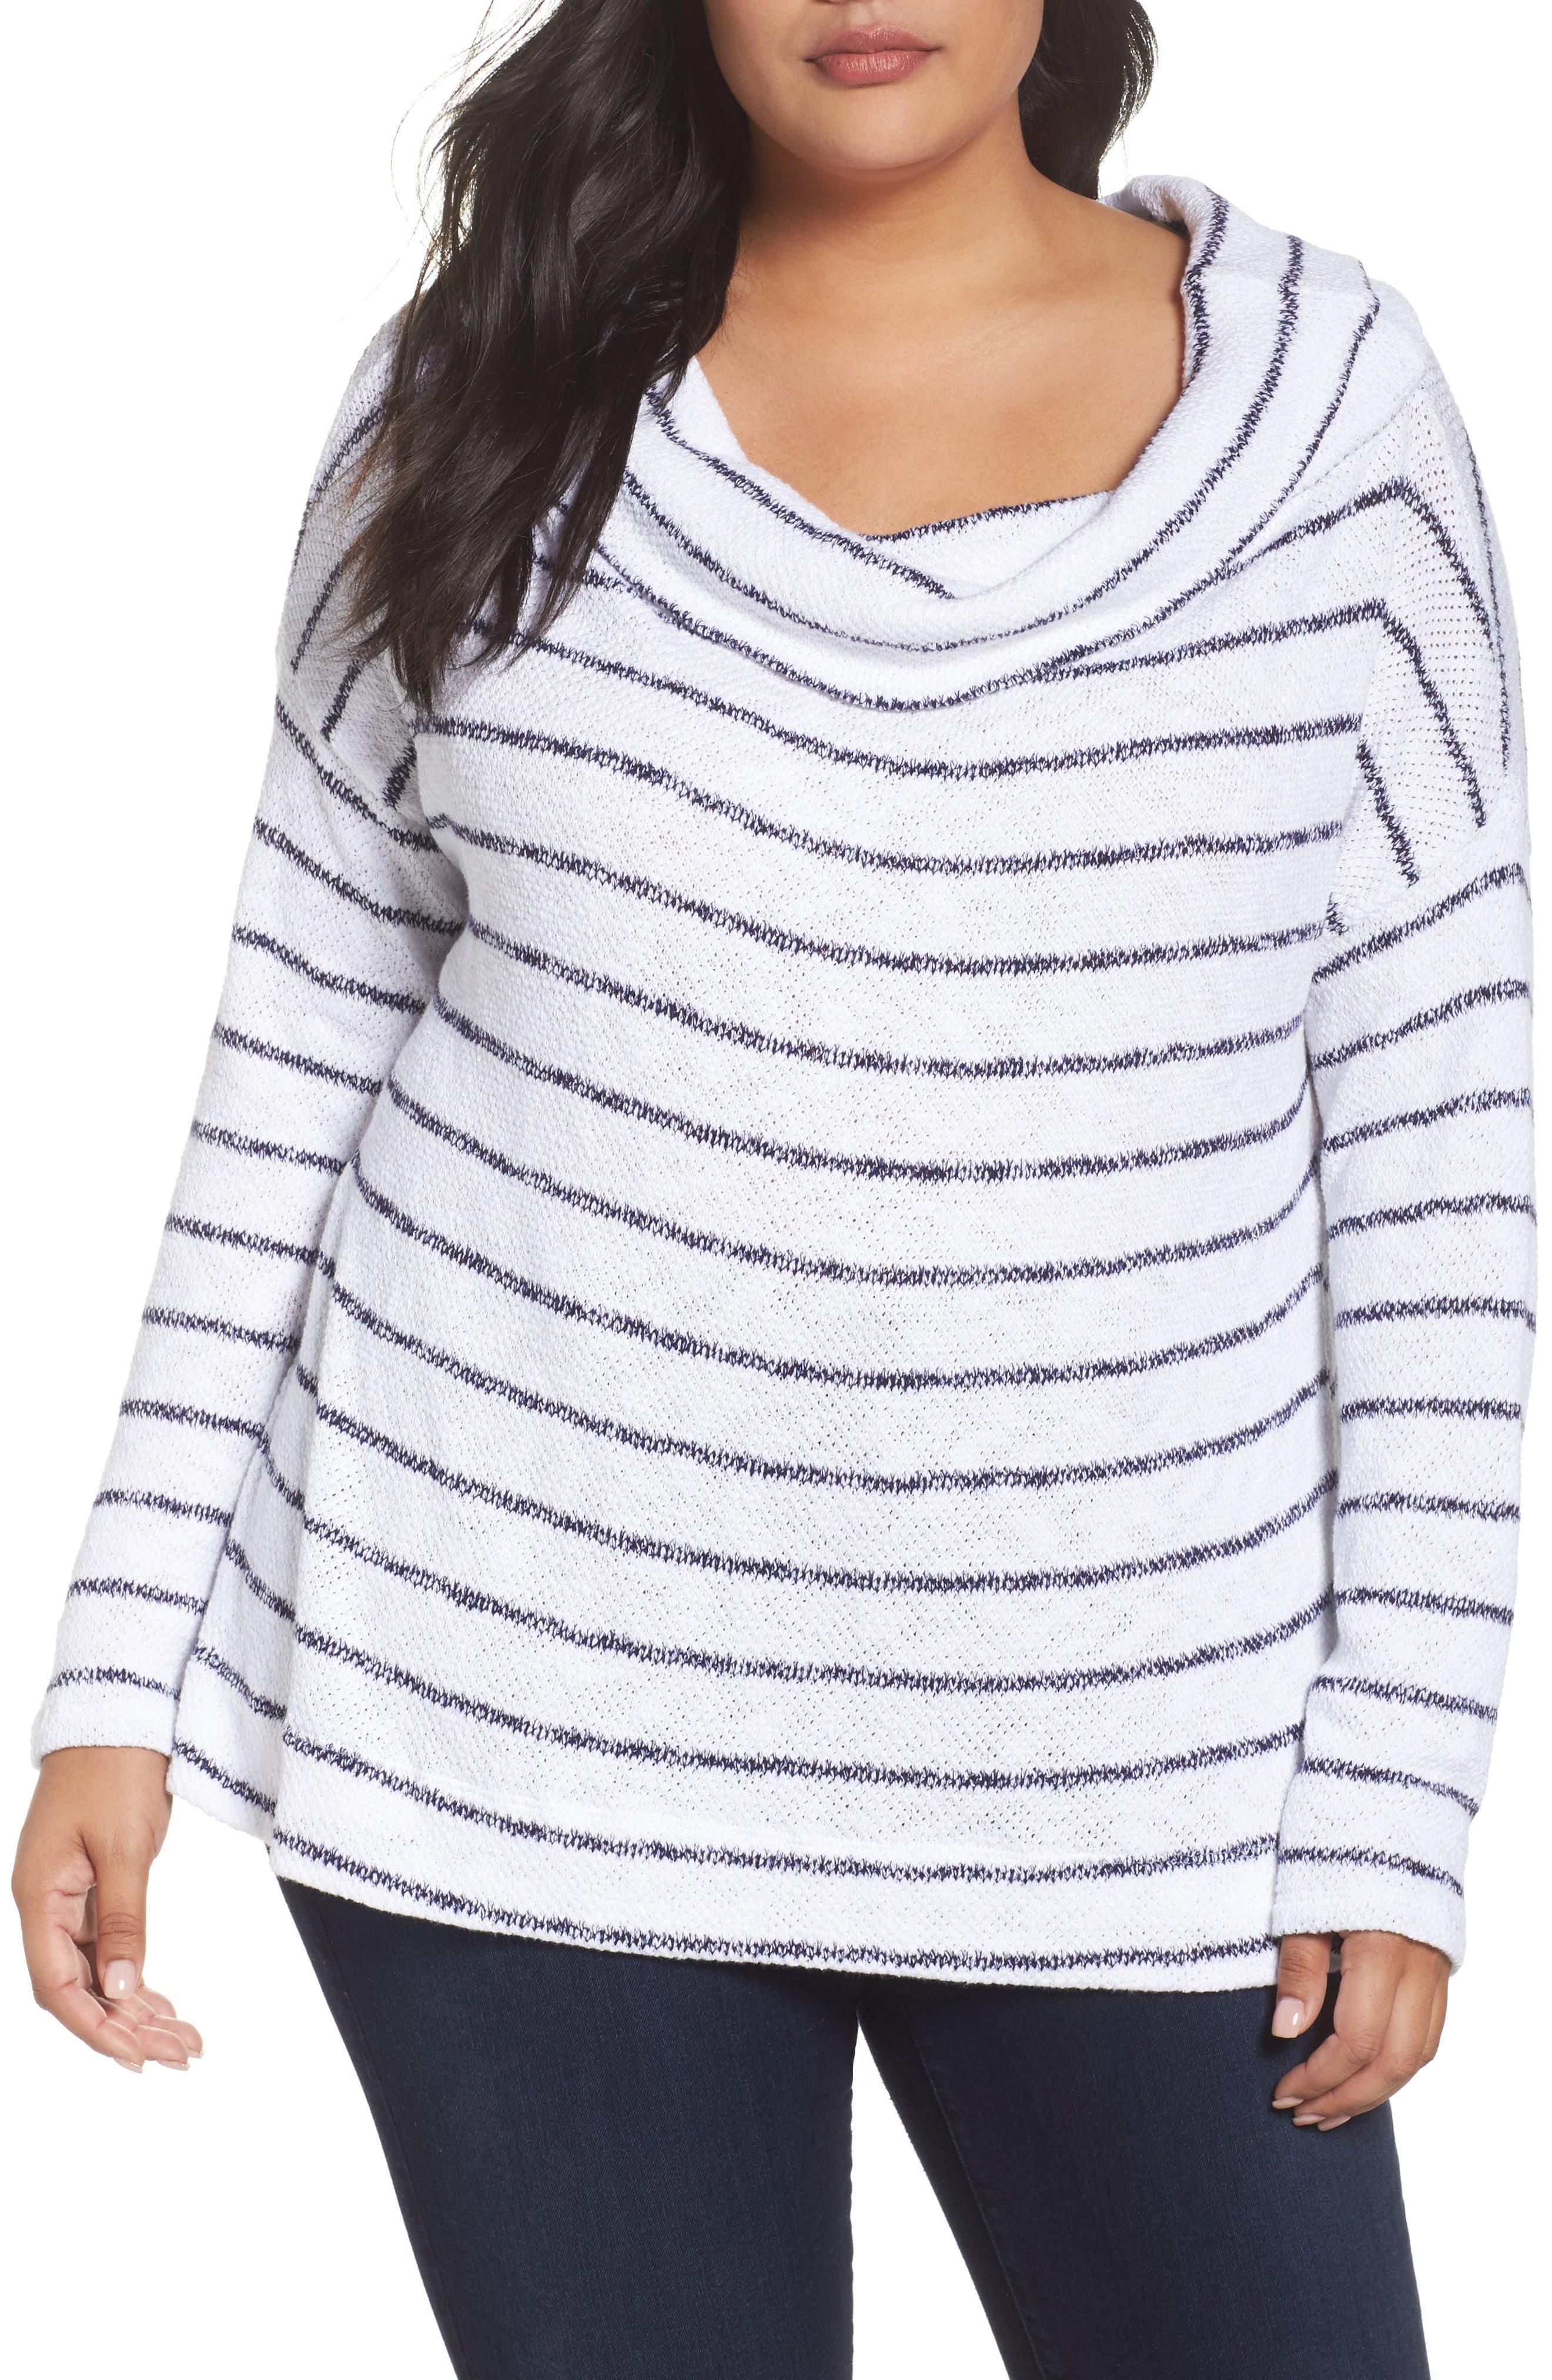 Convertible Neck Pullover,                         Main,                         color, White- Navy Stripe